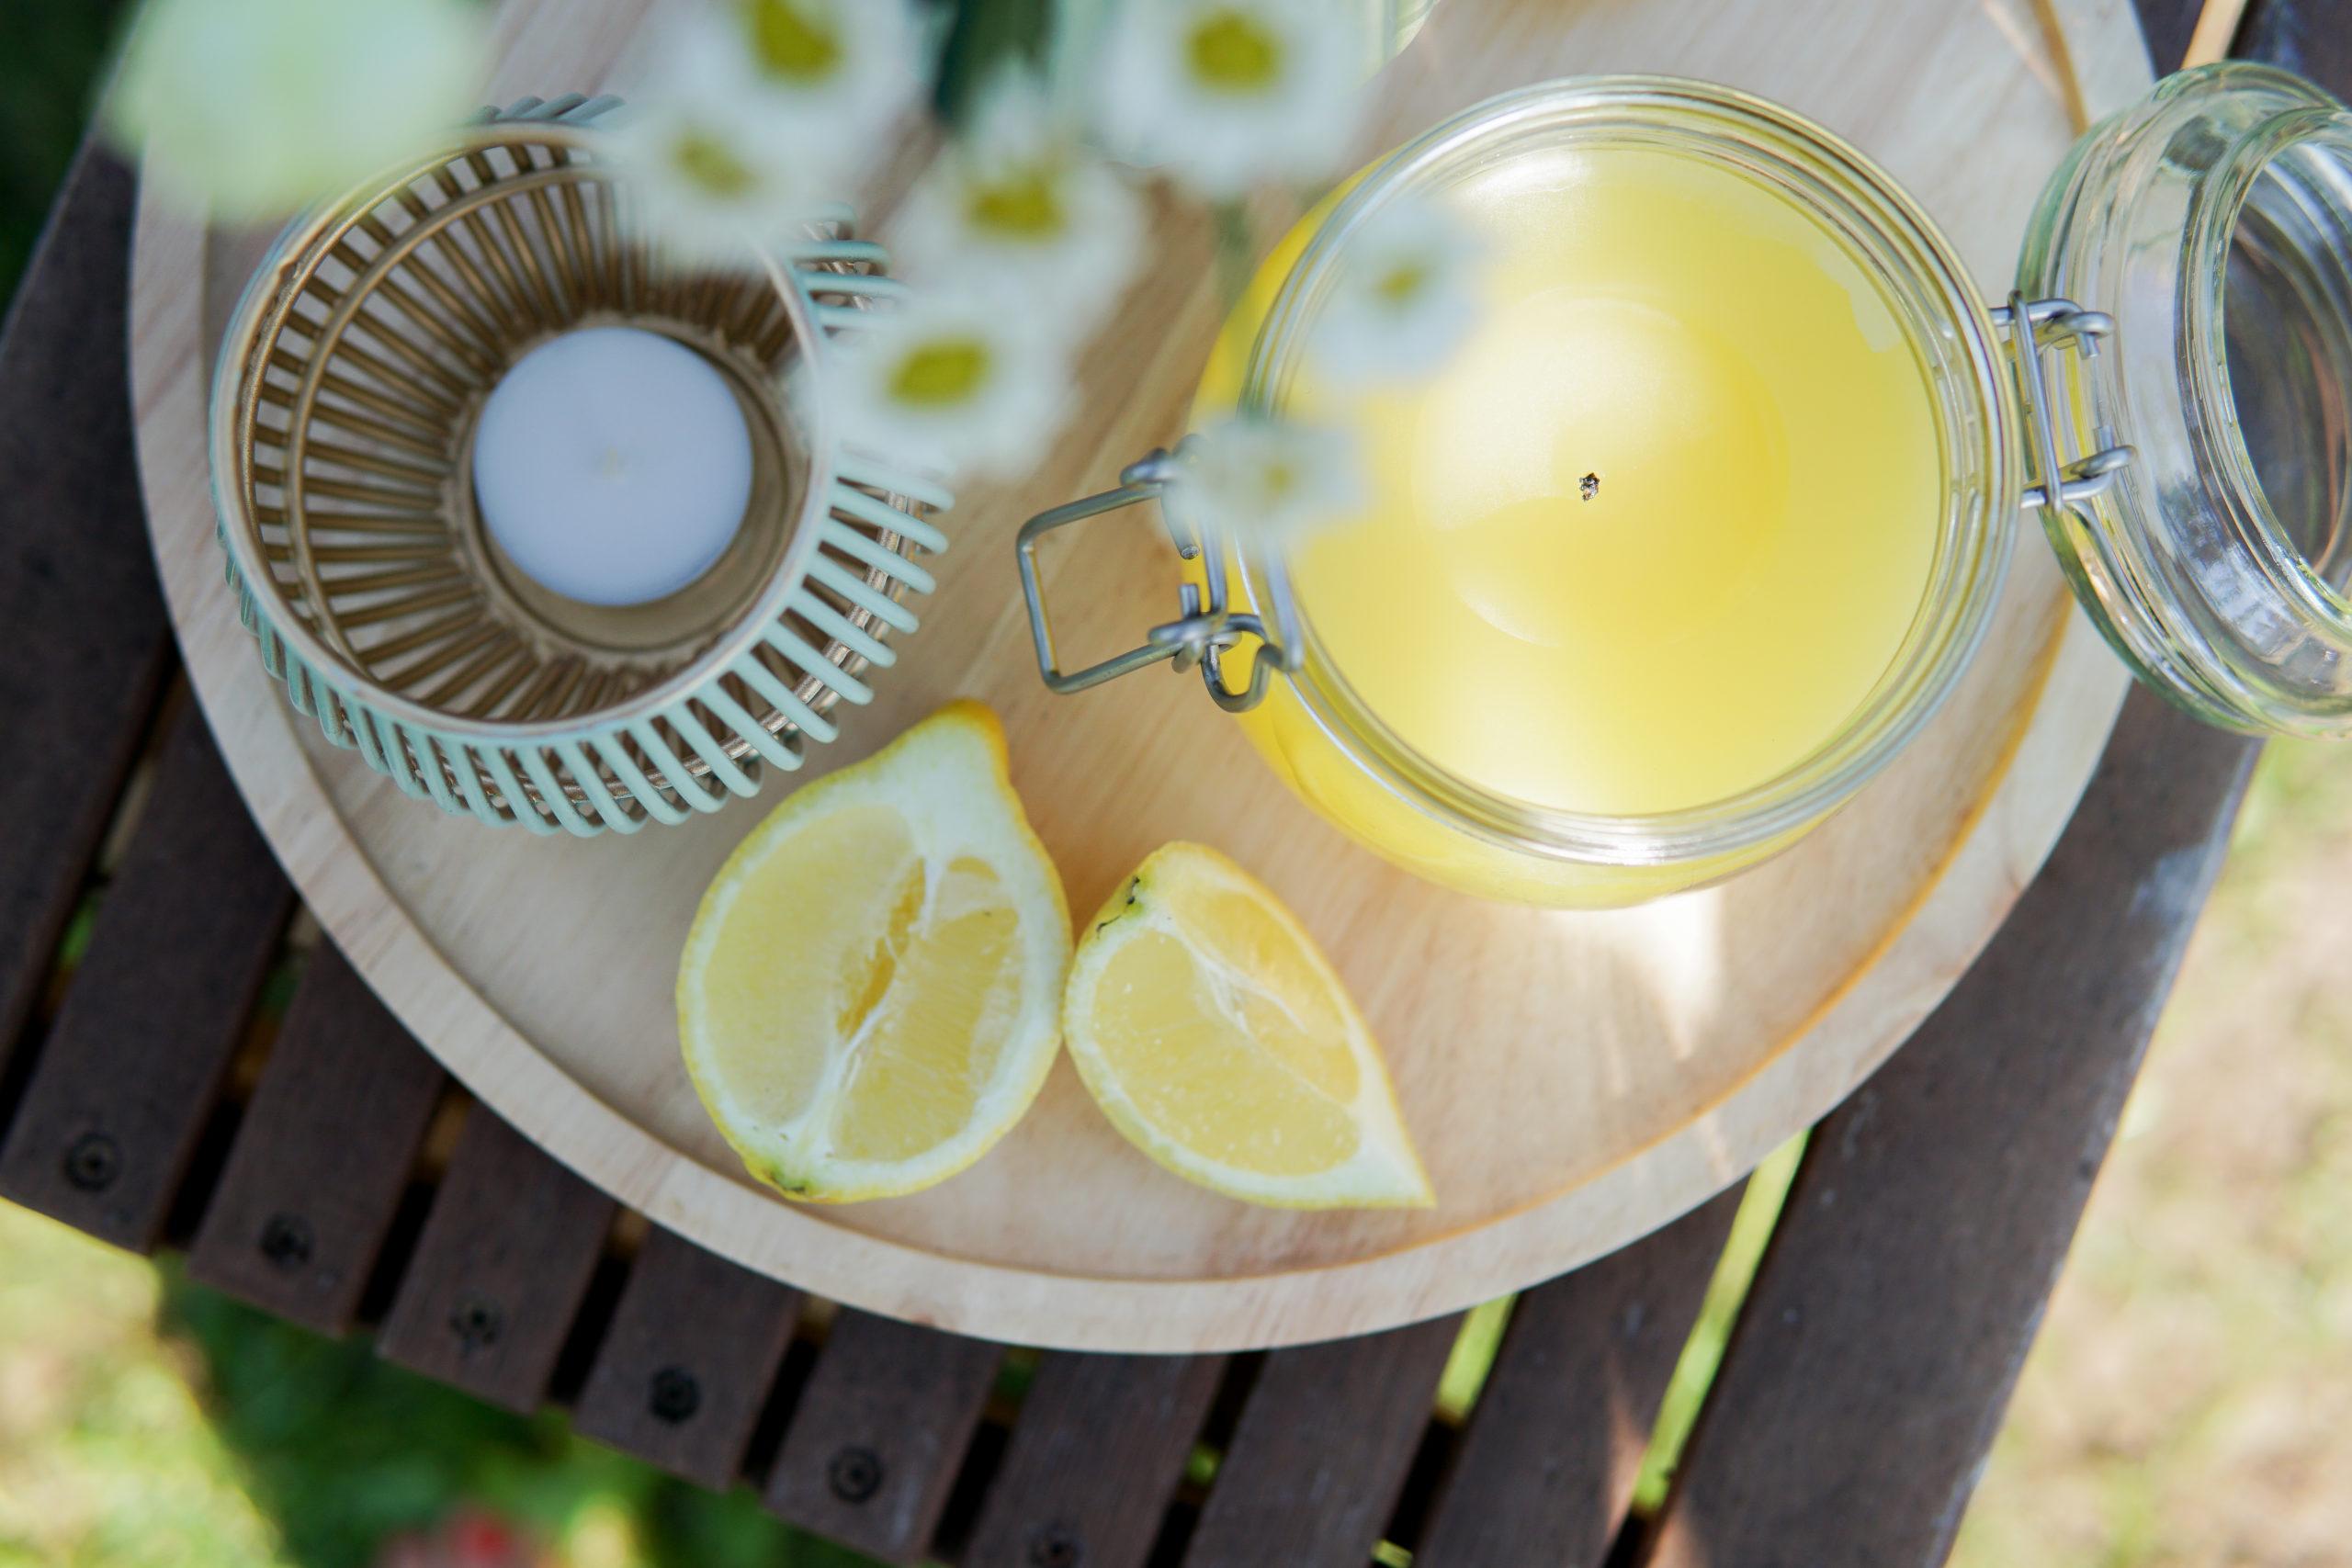 DIY Citronella Kerze gegen Mücken selber machen